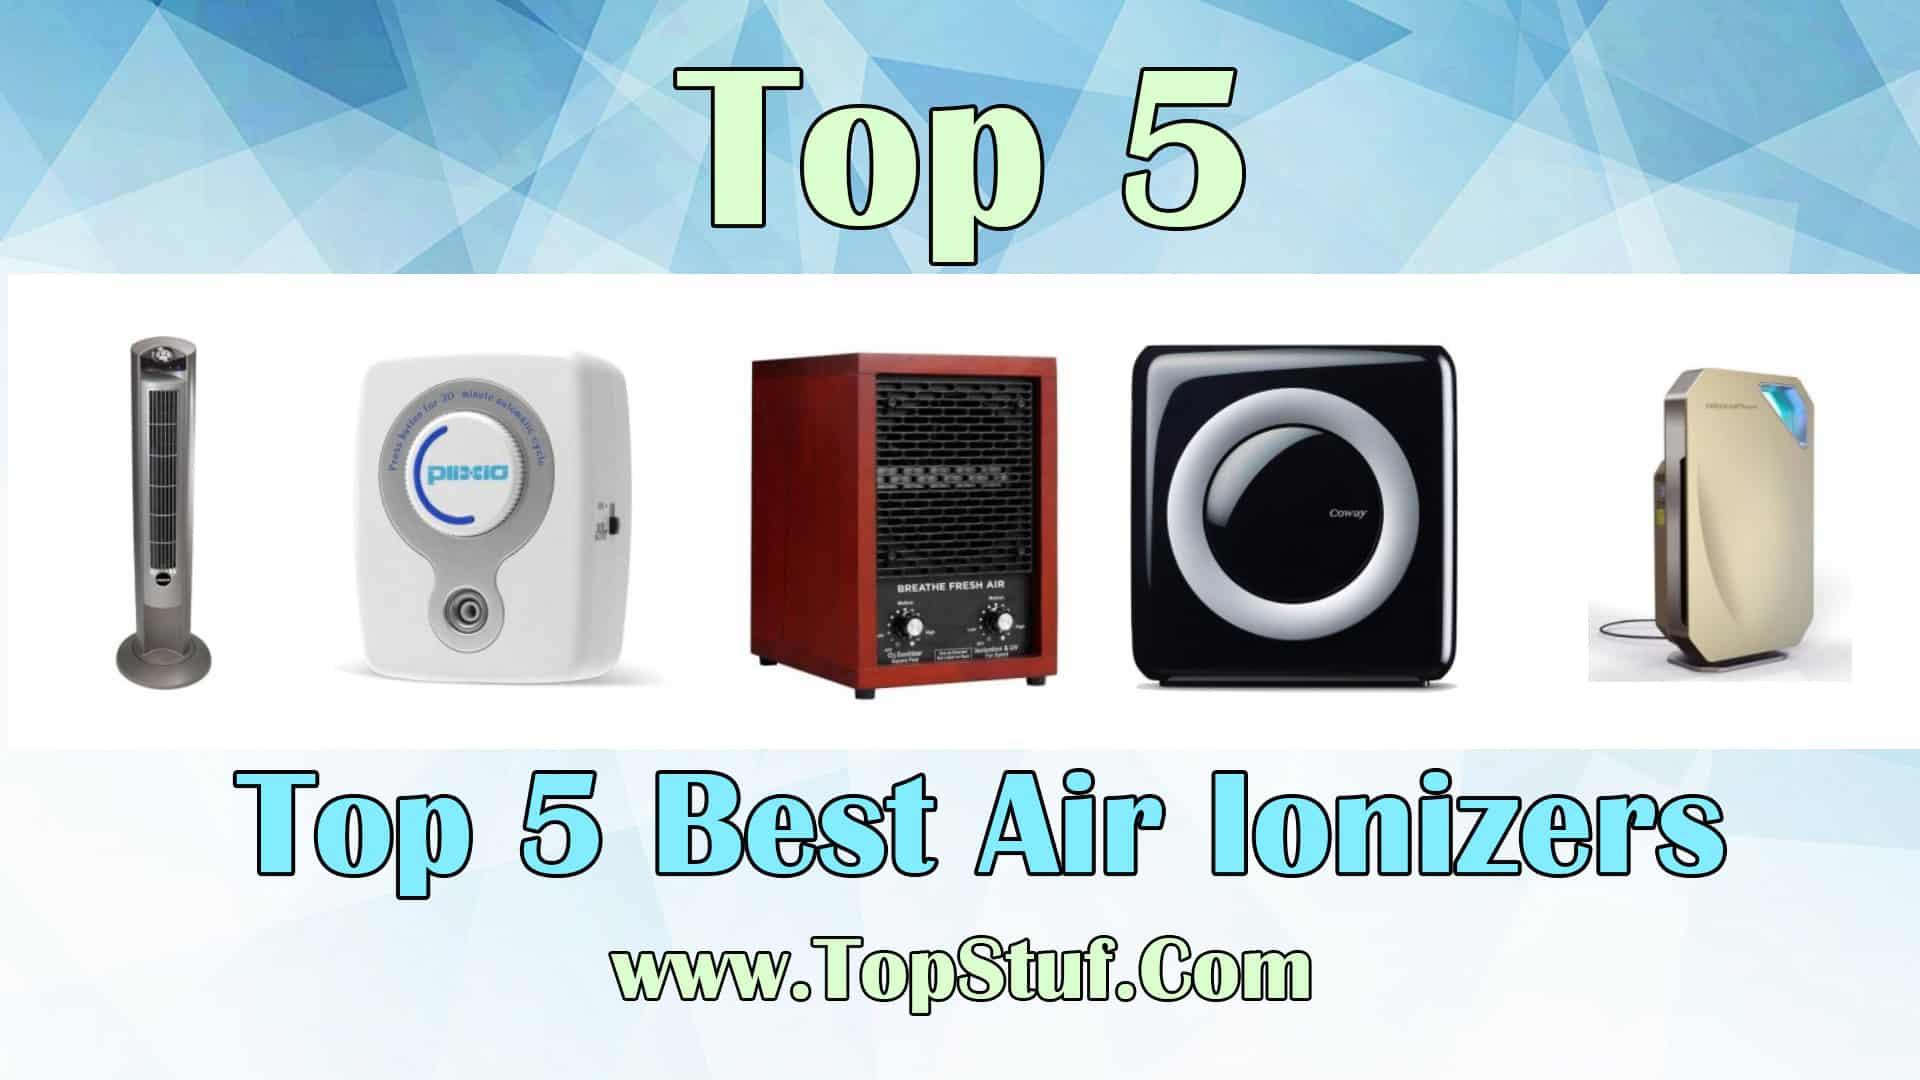 Air Jonizers